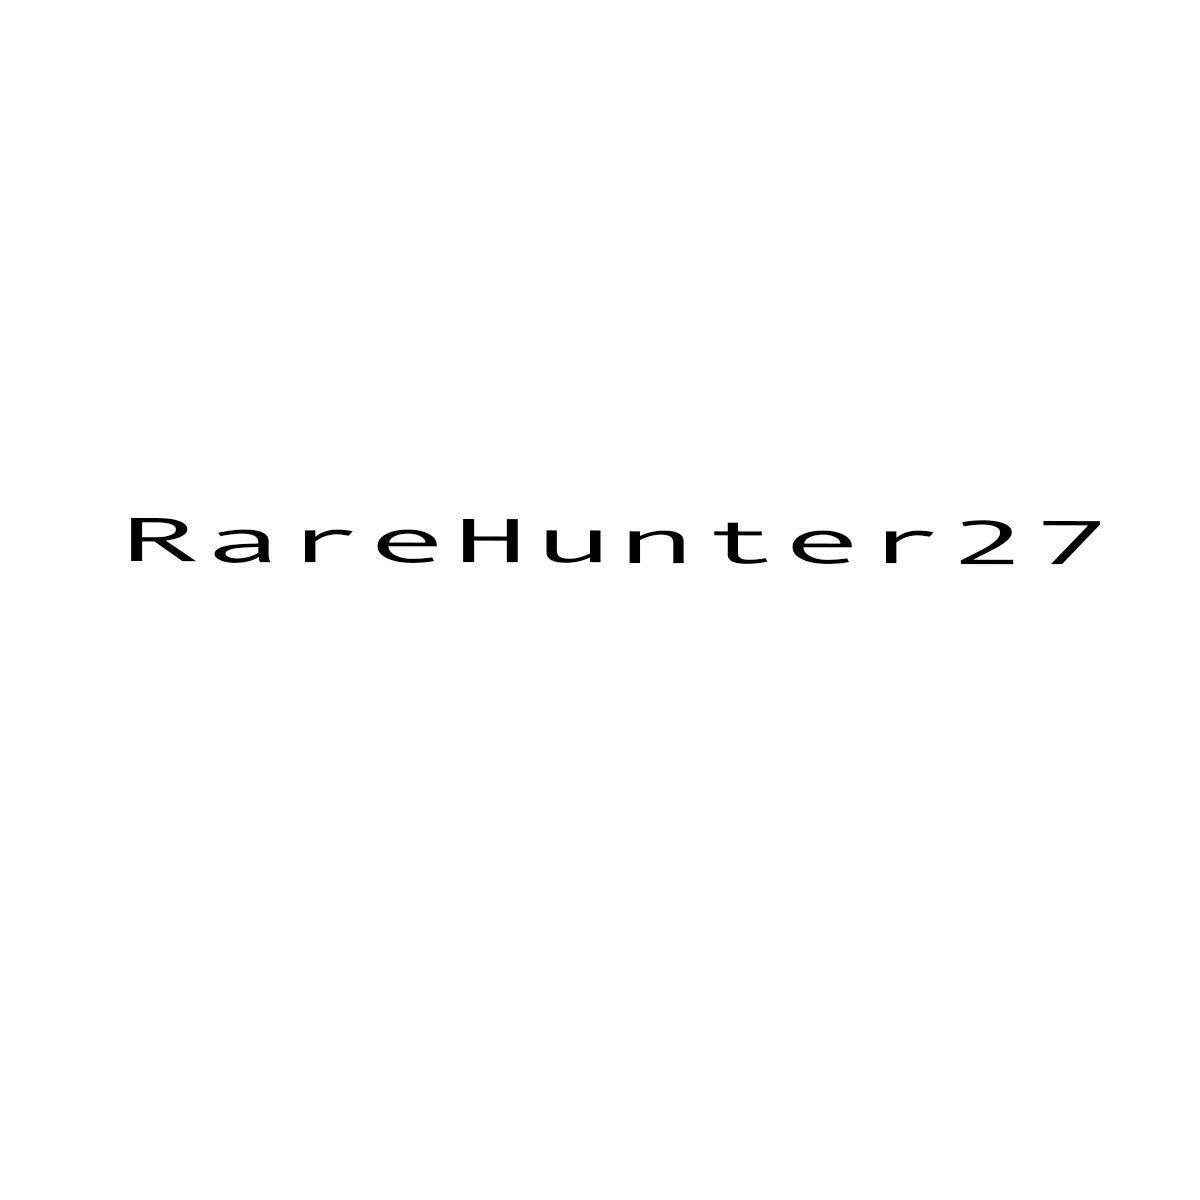 rarehunter27